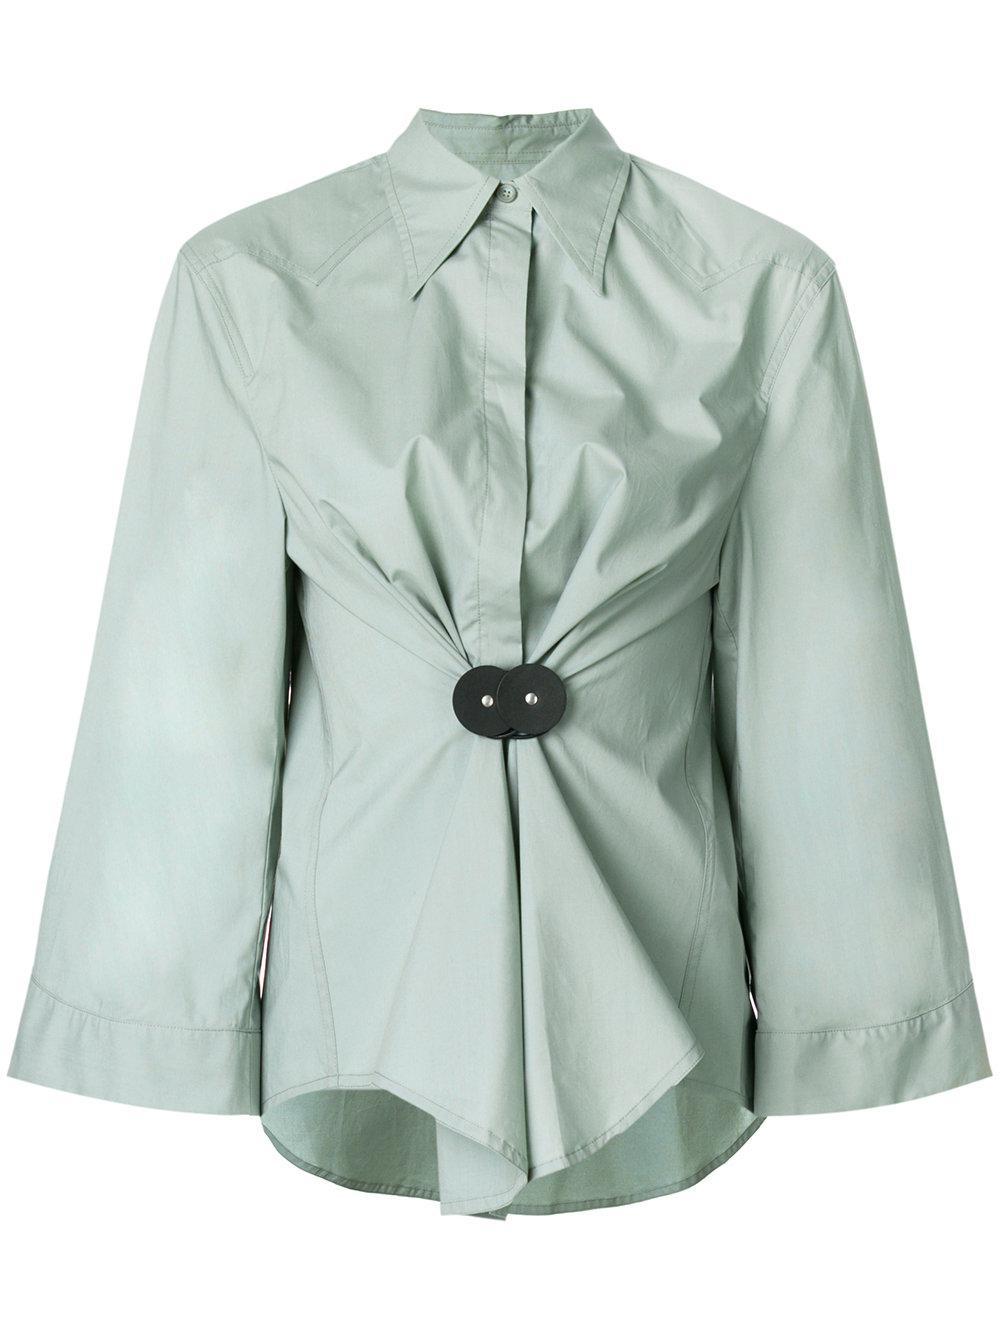 ruched waist shirt - Green Maison Martin Margiela Clearance 3BuJq8R